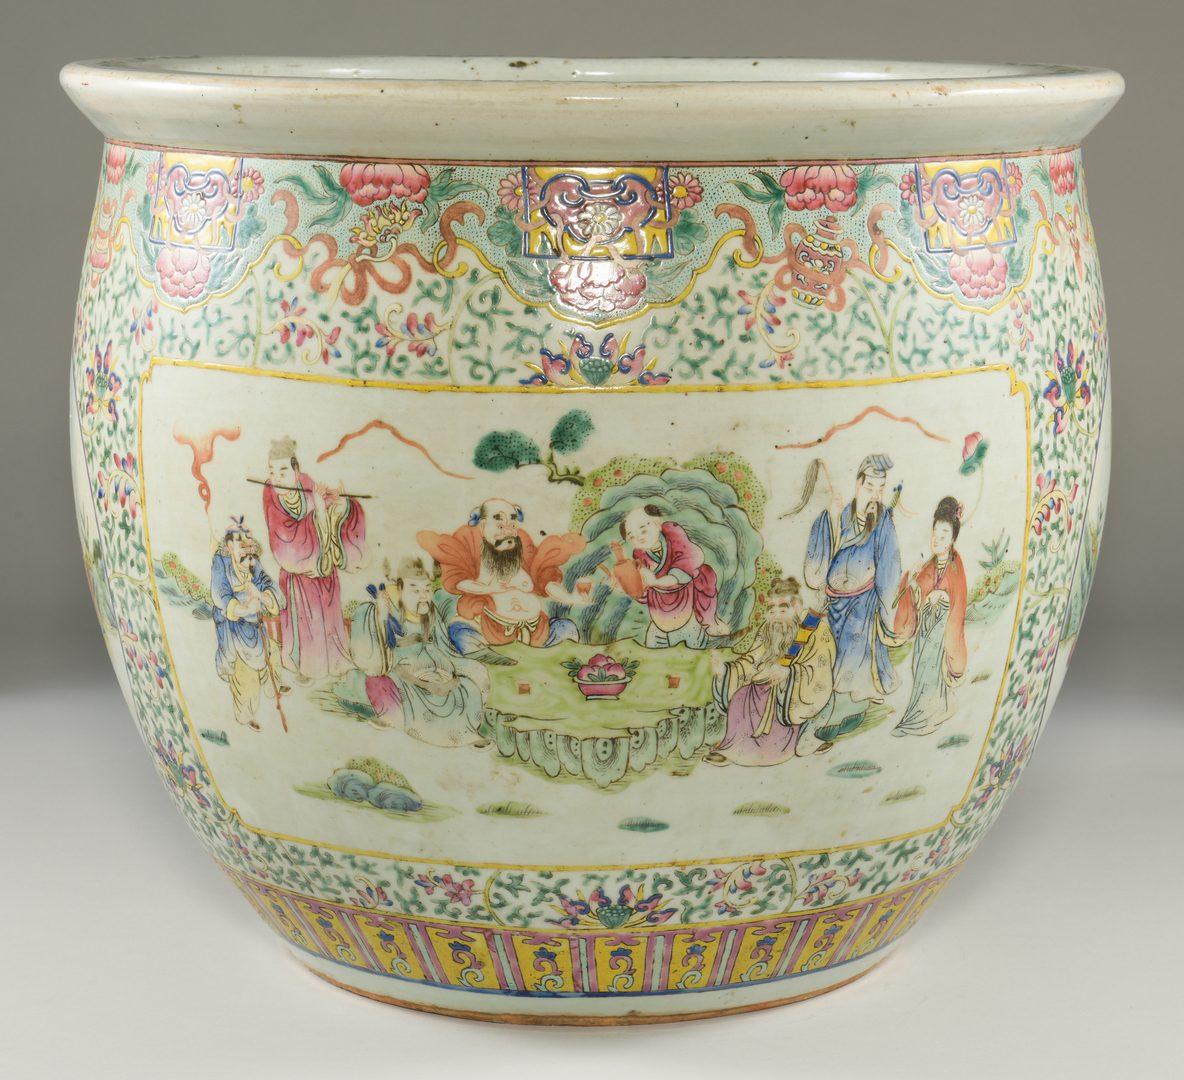 Lot 22: Famille Rose Porcelain Fish Bowl, Republic Period